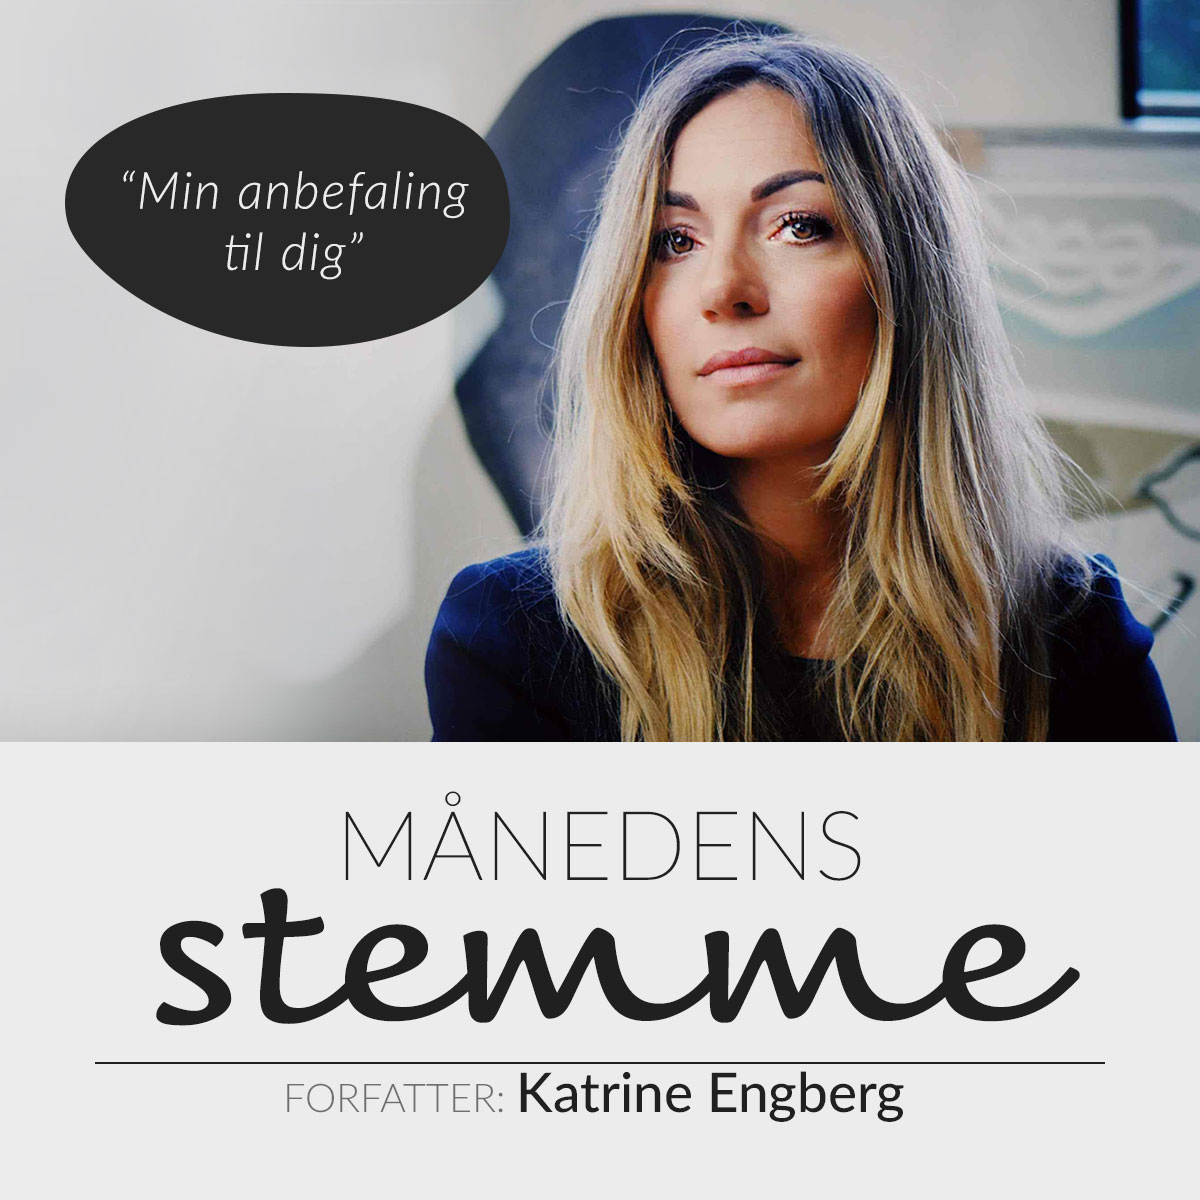 Månedens stemme Katrine Engberg